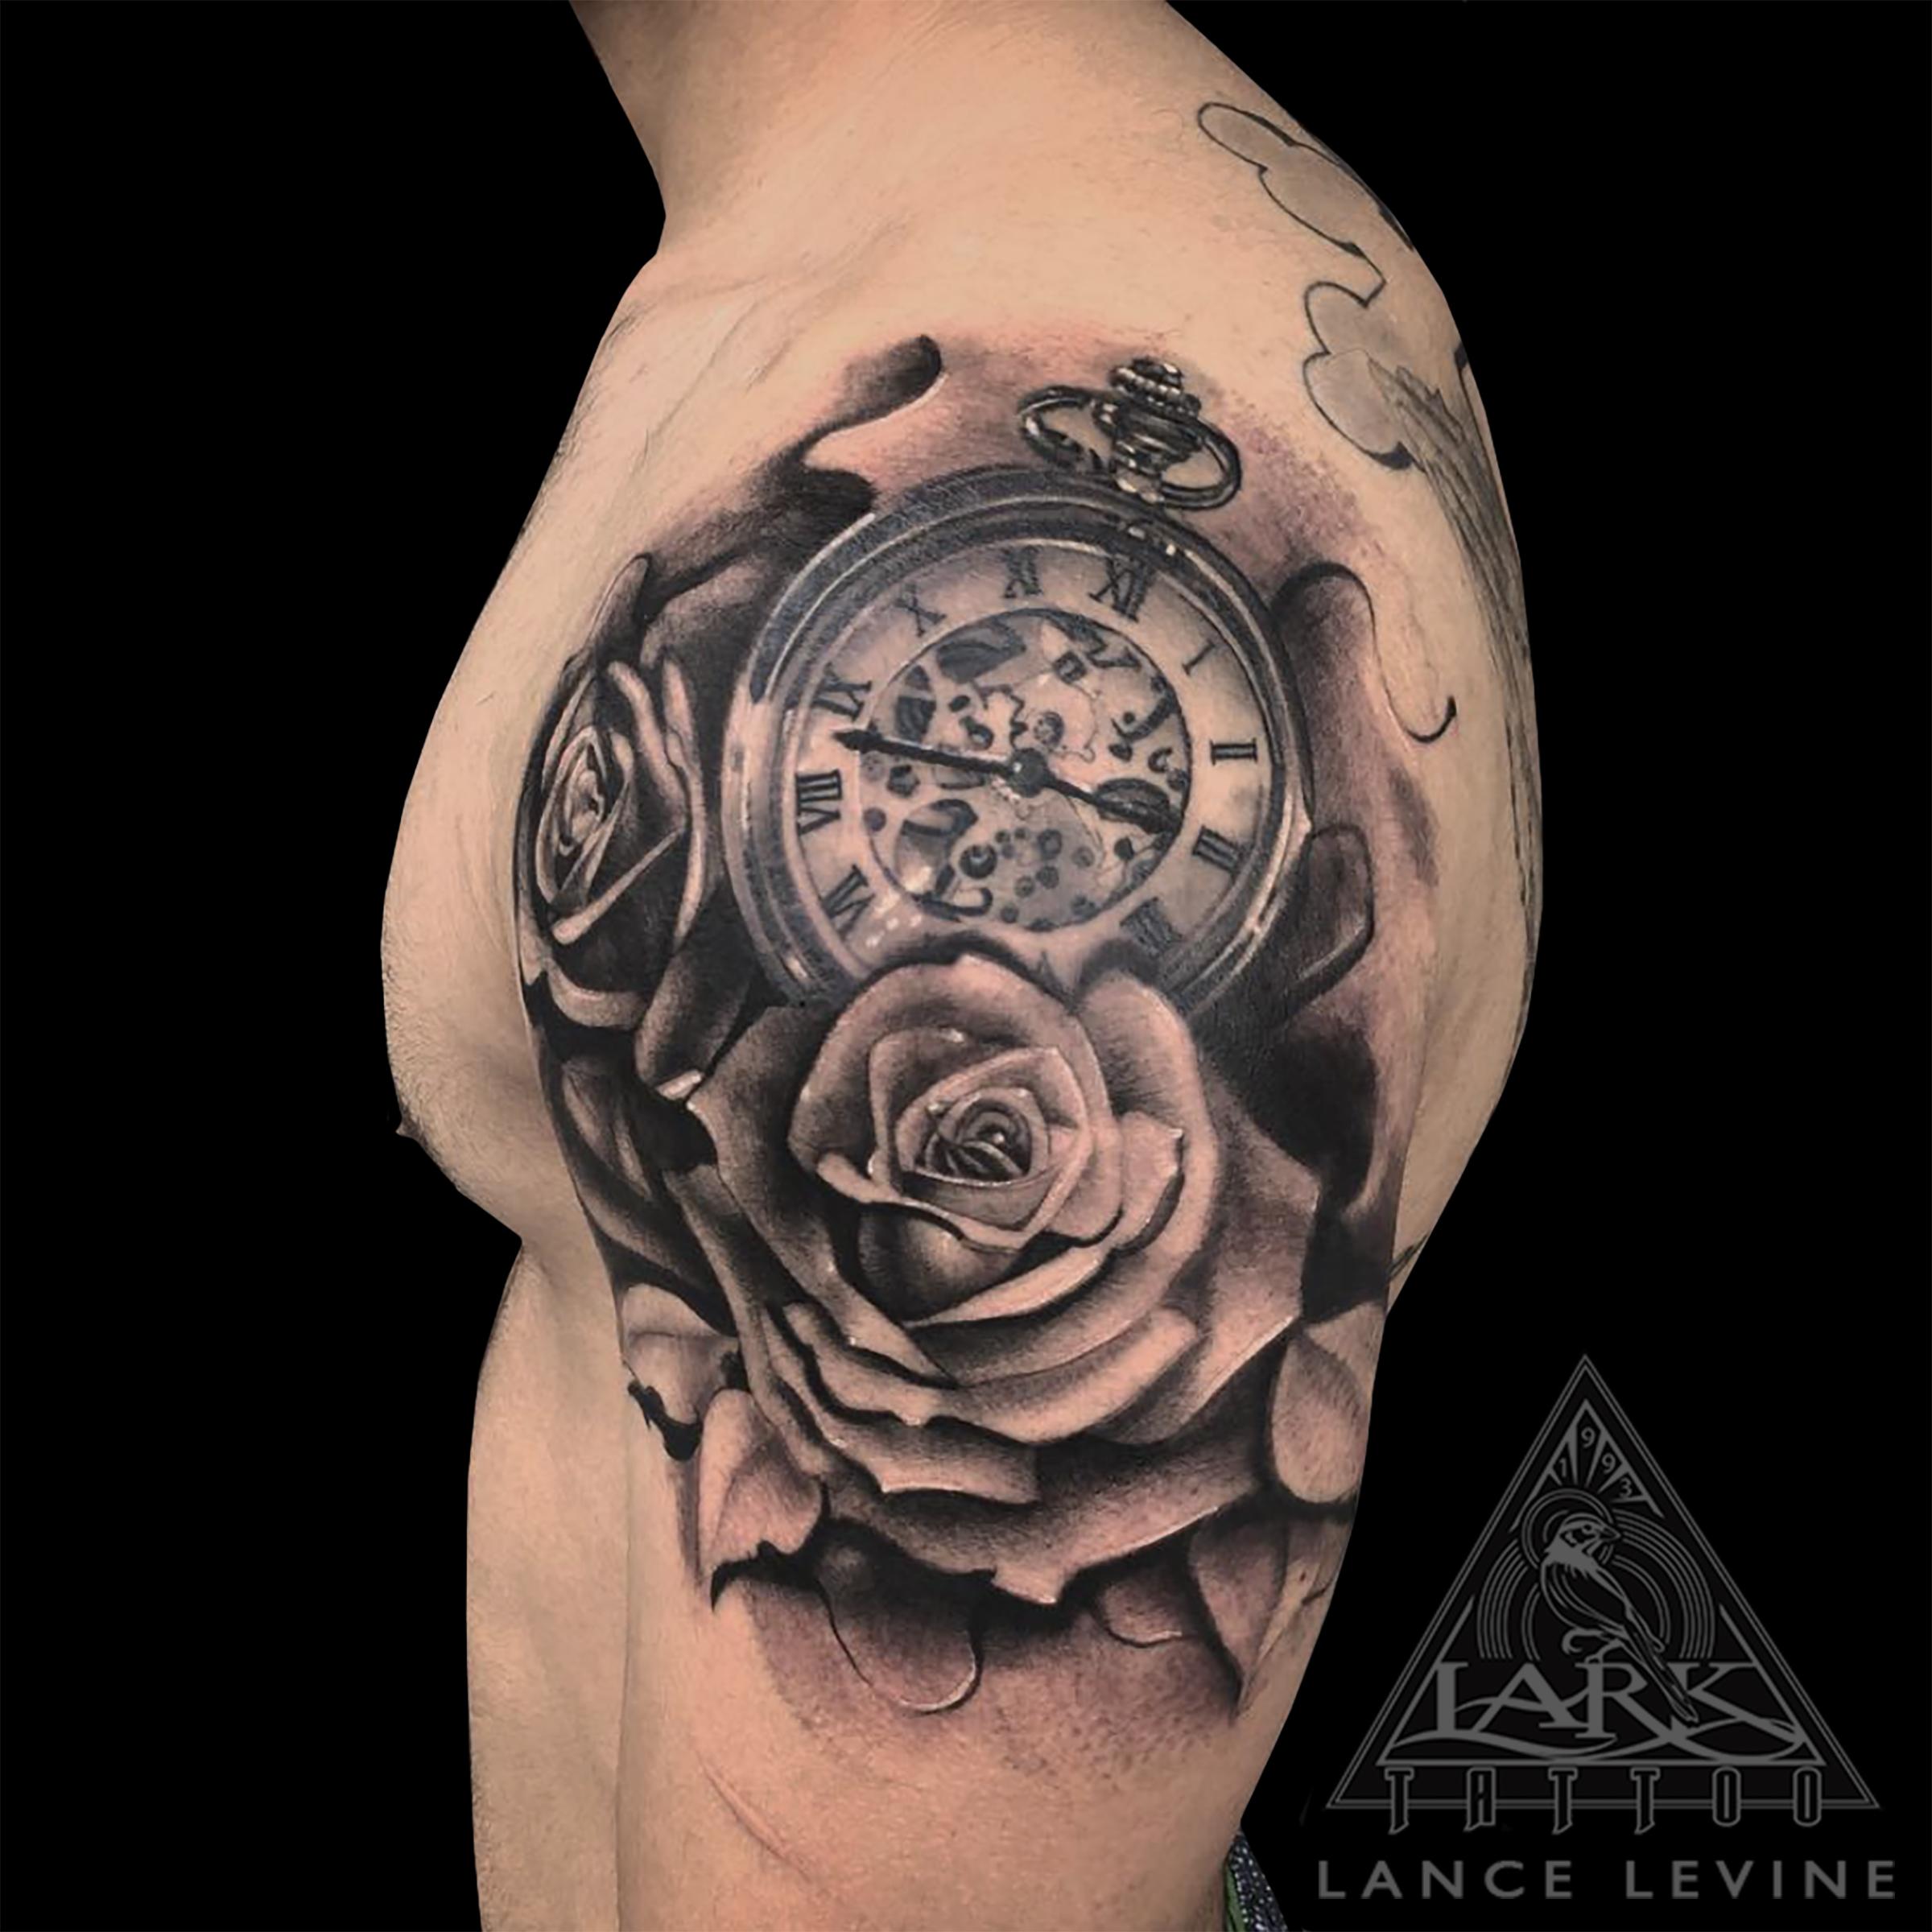 bng, bngtattoo, blackandgraytattoo, blackandgreytattoo, bngink, bnginksociety, rose, roses, rosetattoo, rosestattoo, pocketwatch, pocketwatchtattoo, armtattoo, halfsleeve, halfsleevetattoo, realistictattoo, realismtattoo, clocktattoo, watchtattoo, tattoo, tattoos, tat, tats, tatts, tatted, tattedup, tattoist, tattooed, inked, inkedup, ink, tattoooftheday, amazingink, bodyart, tattooig, tattoosofinstagram, instatats , larktattoo, larktattoos, larktattoowestbury, westbury, longisland, NY, NewYork, usa, art